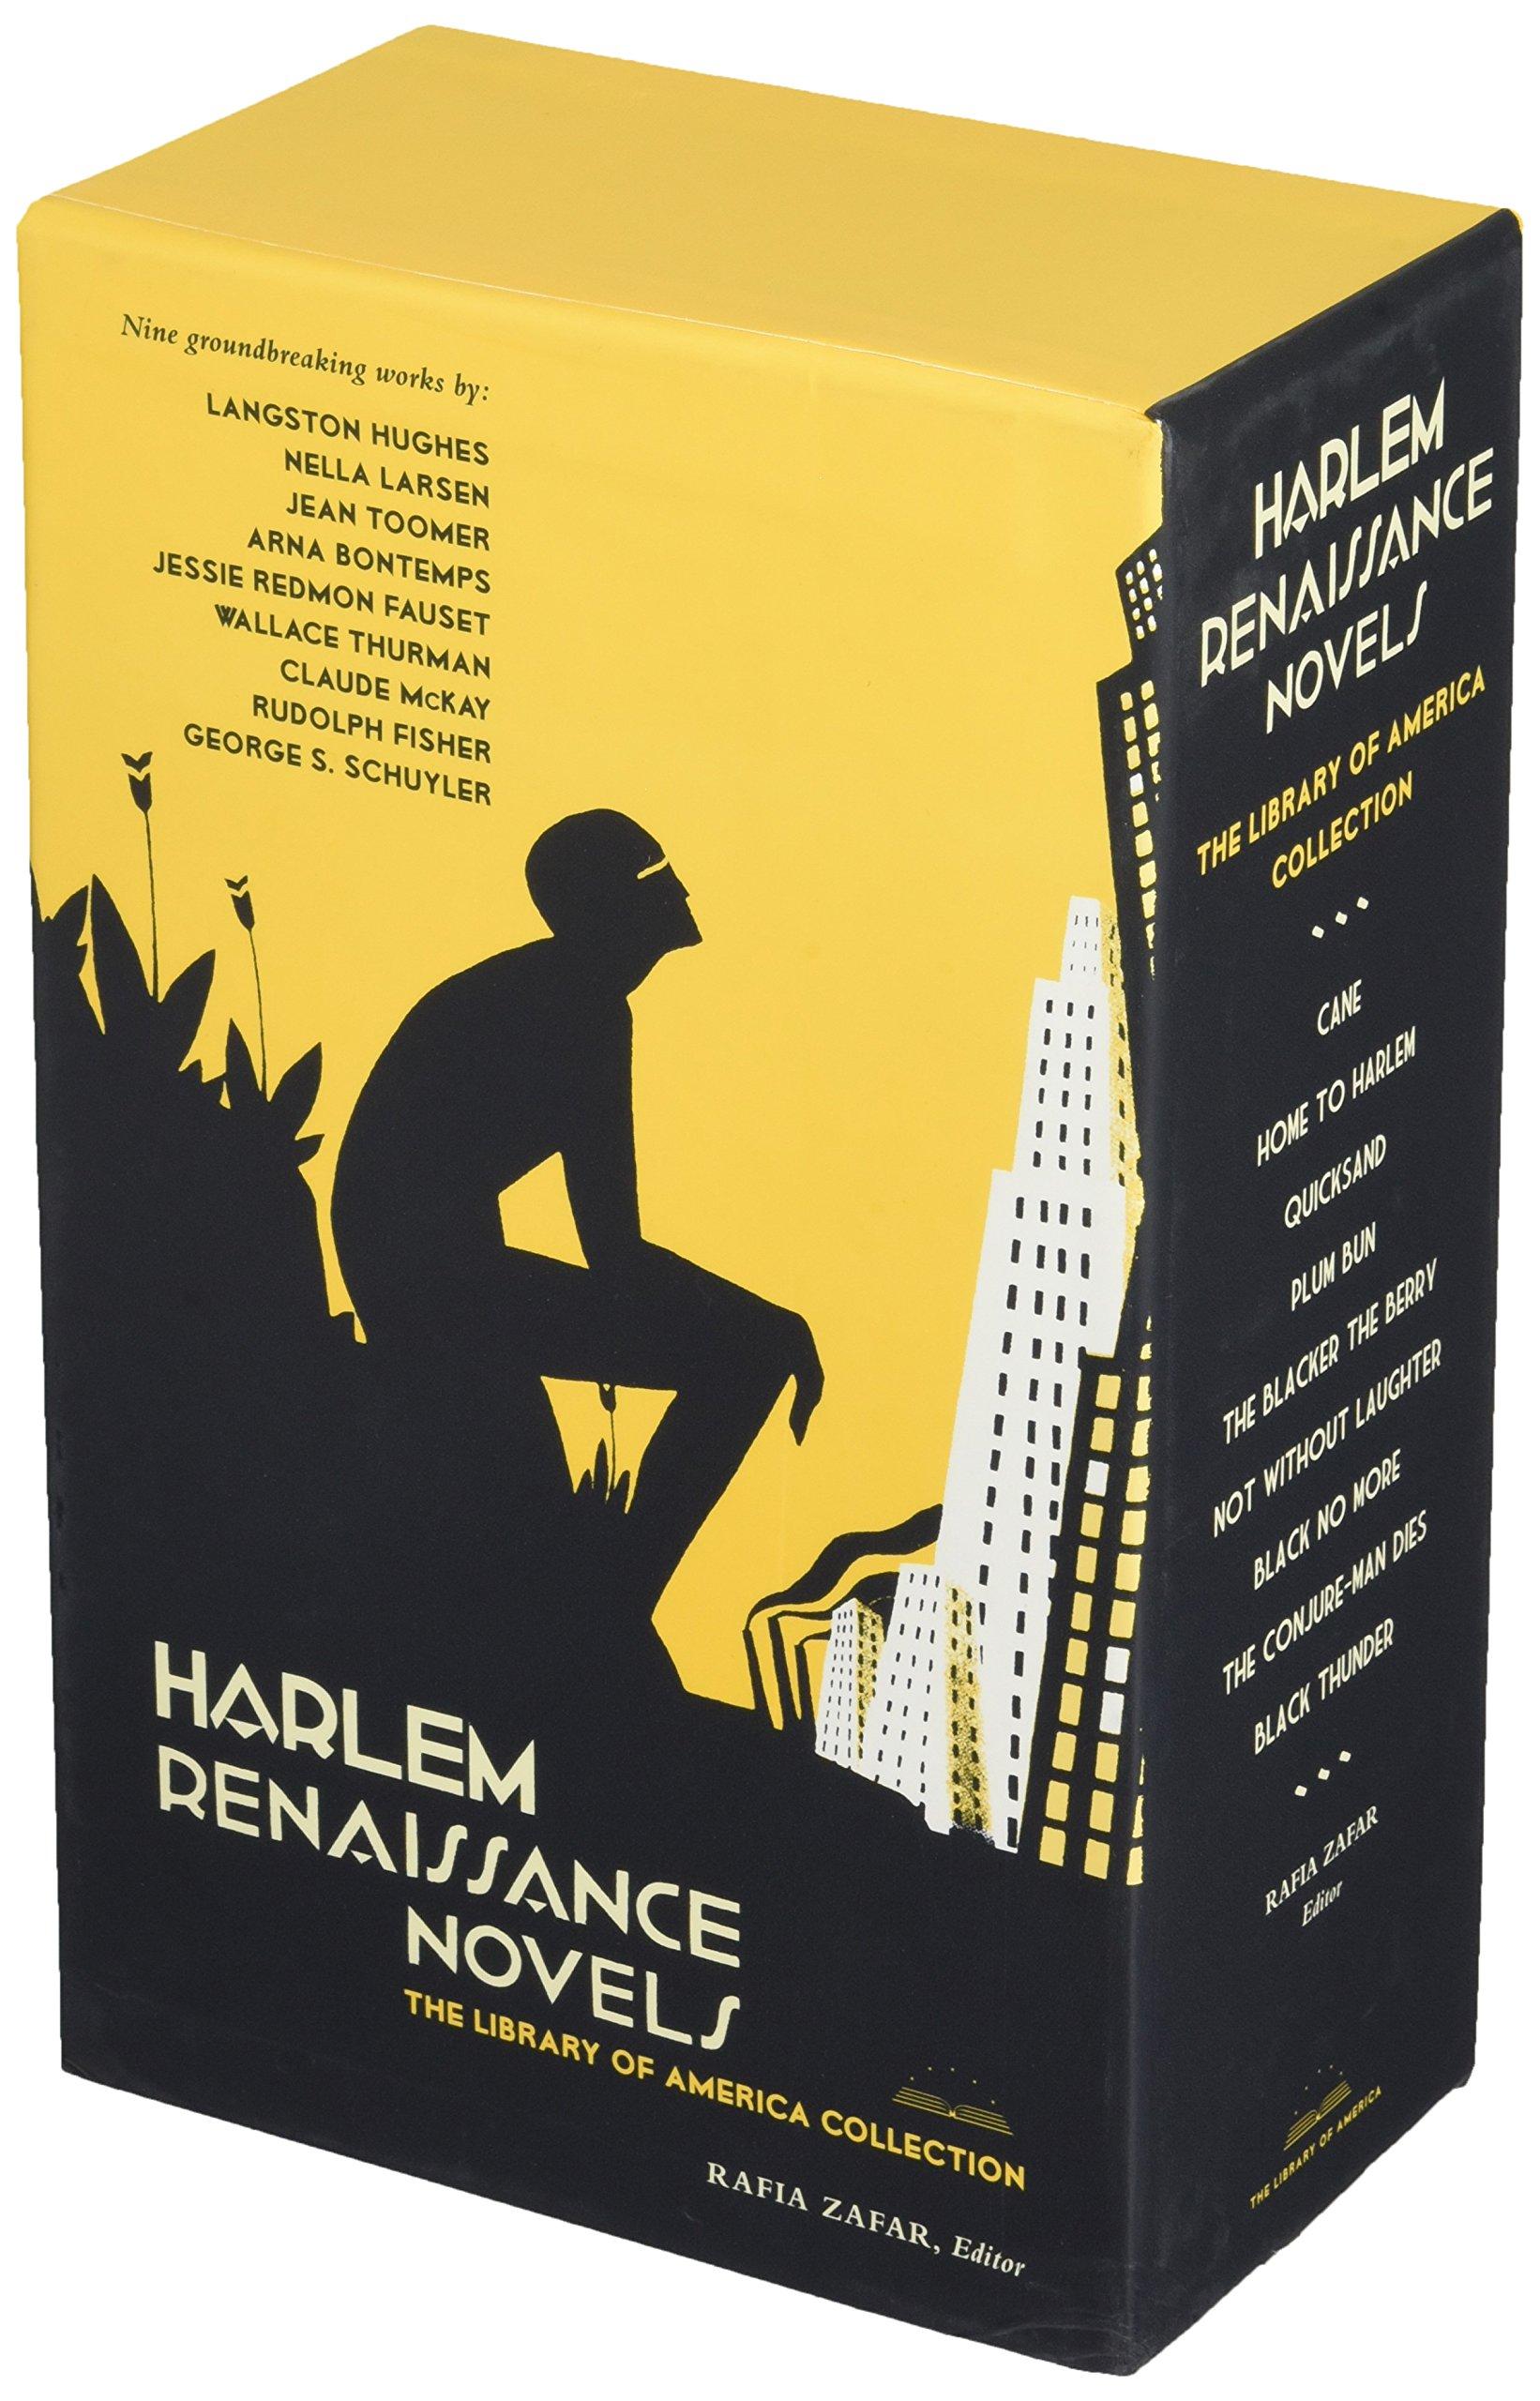 Amazon Harlem Renaissance Novels The Library Of America Collection Two Volume Boxed Set 9781598531060 Rafia Zafar Books